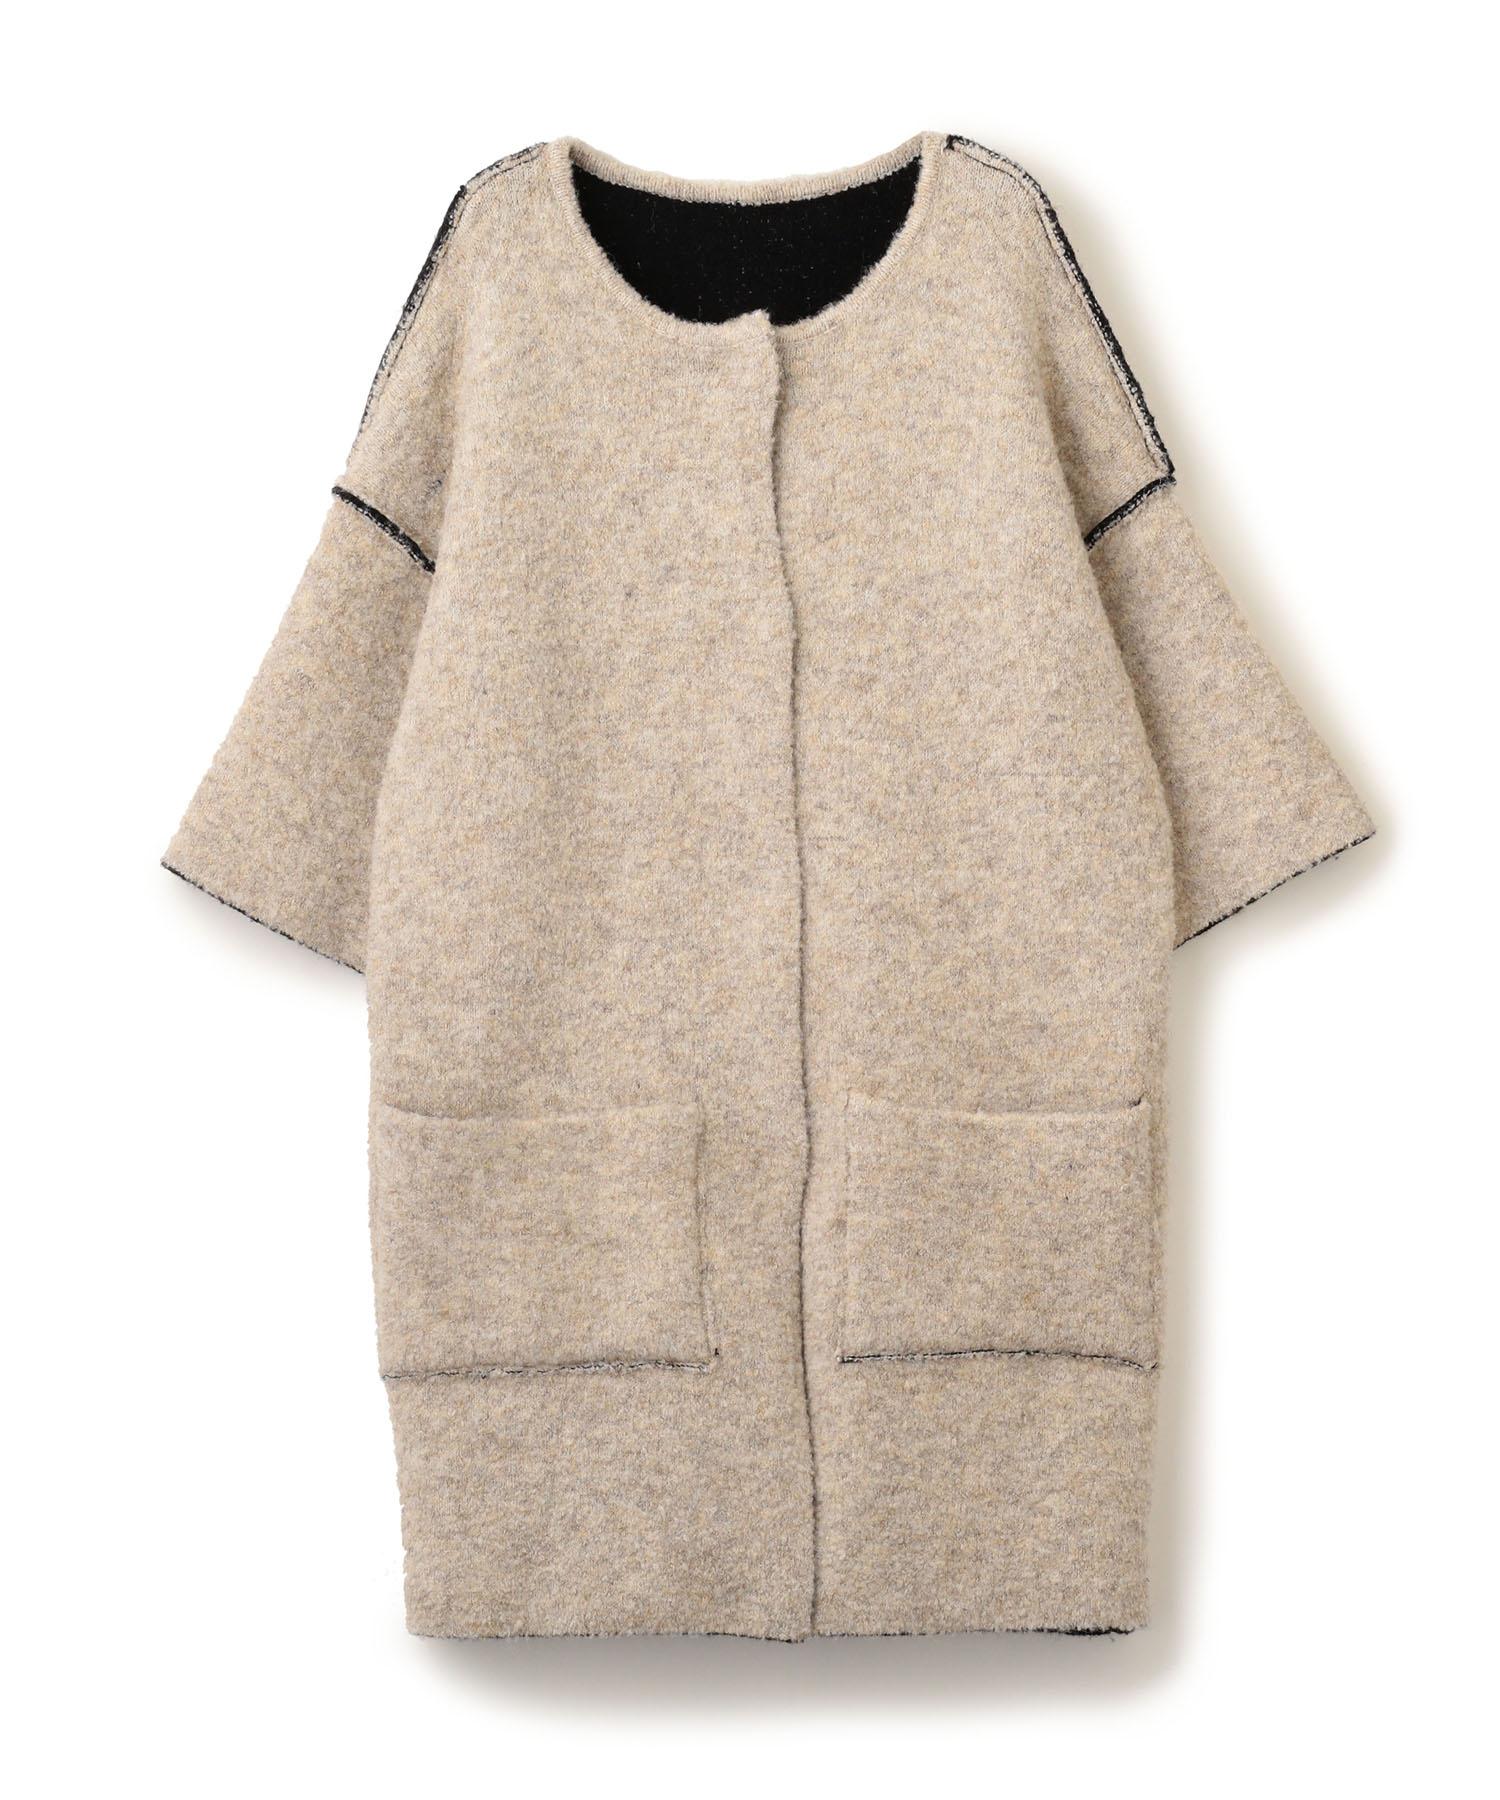 Reversible Knit Coat